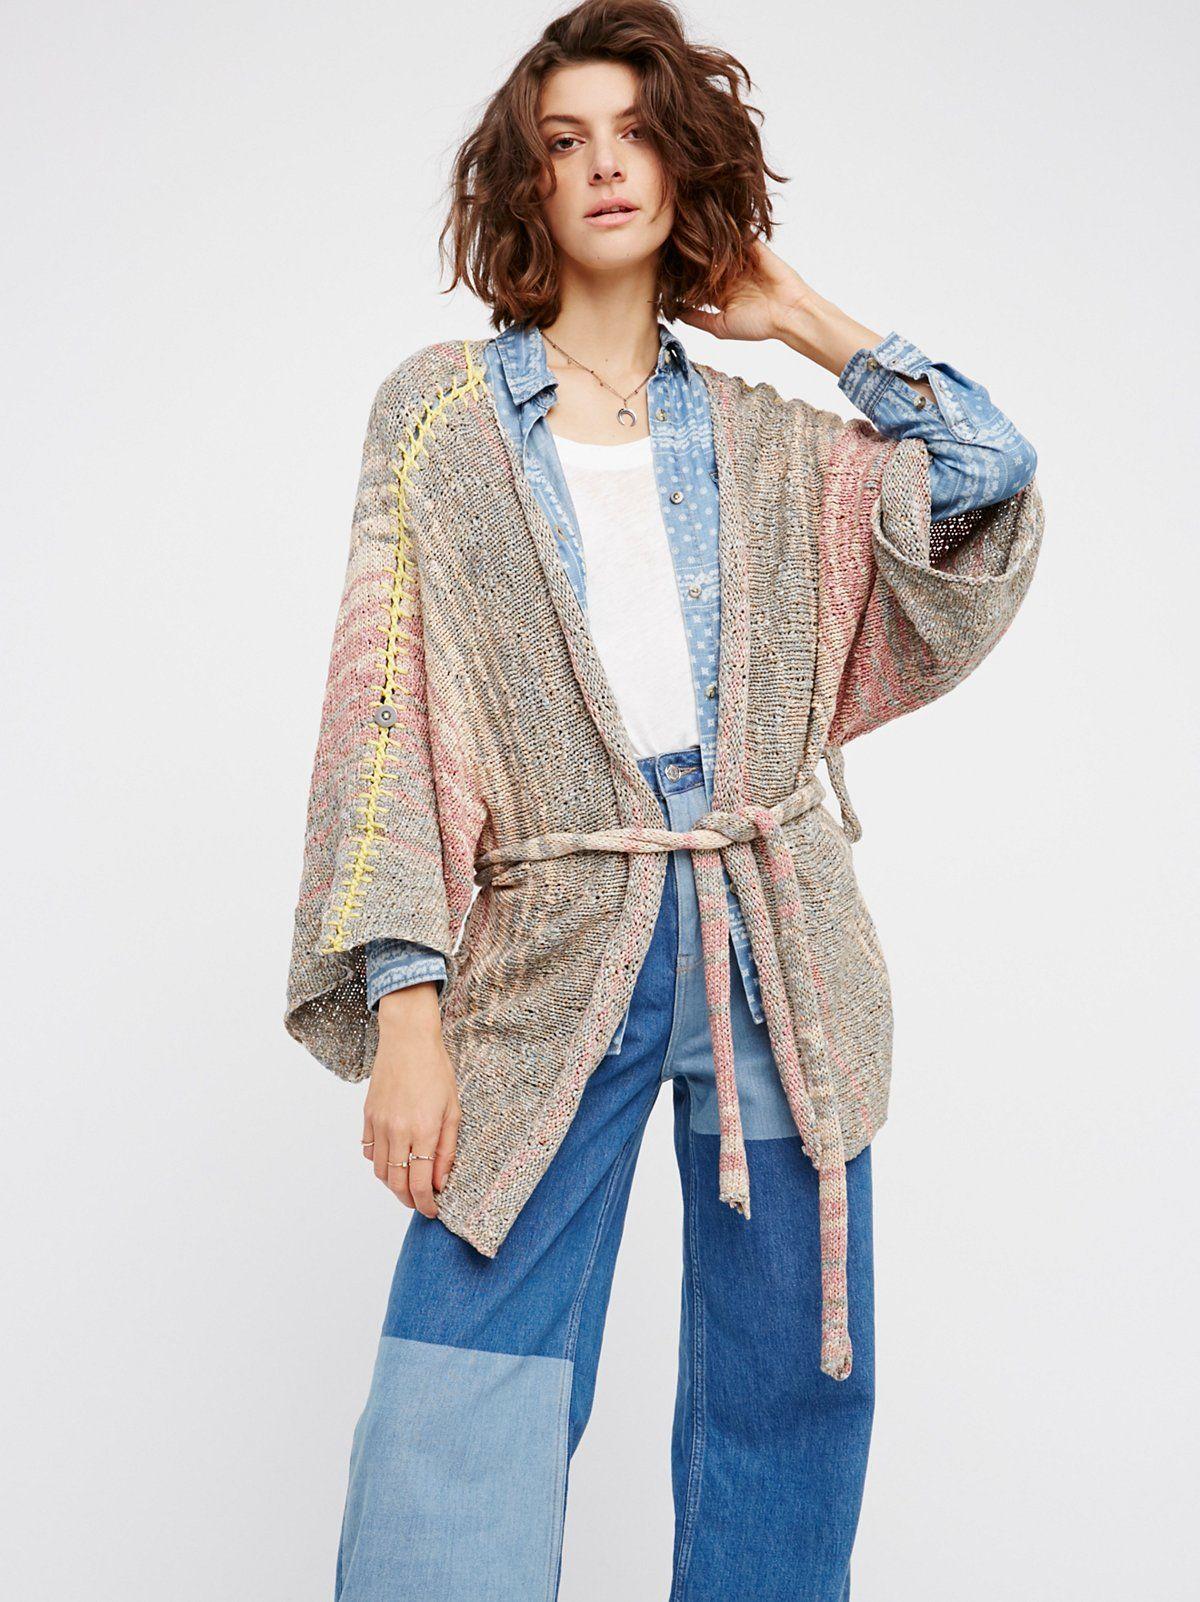 Sand Art Kimono | Drape this beautiful knit kimono over any outfit ...